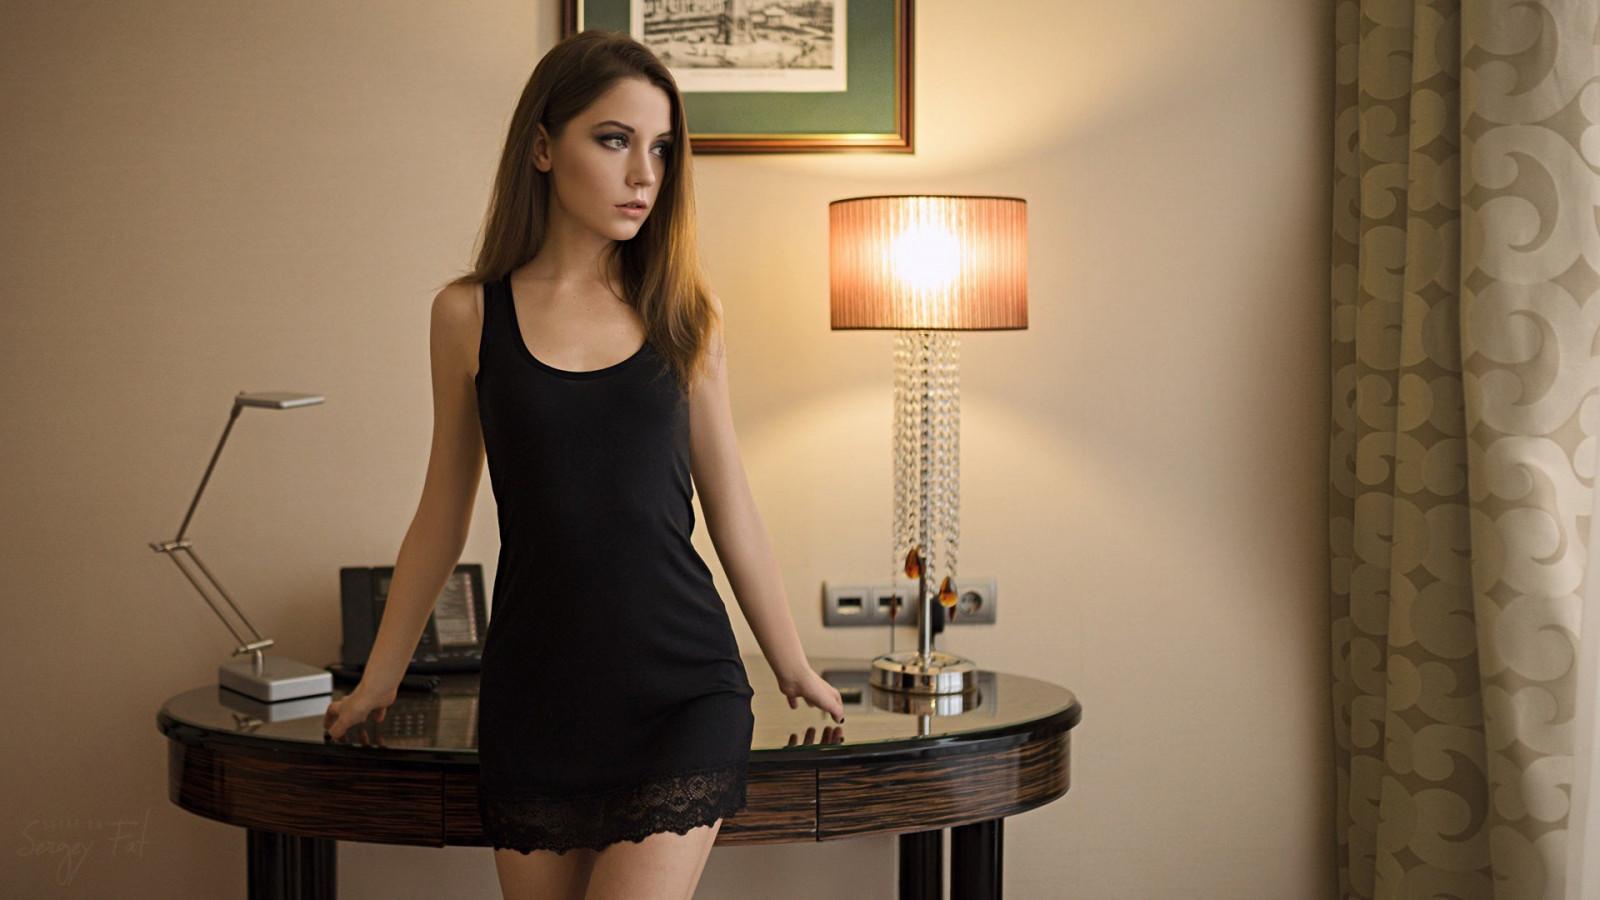 Wallpaper  Women, Portrait, Black Dress, Brunette, Room, Sergey Fat, Ksenia Kokoreva -8273